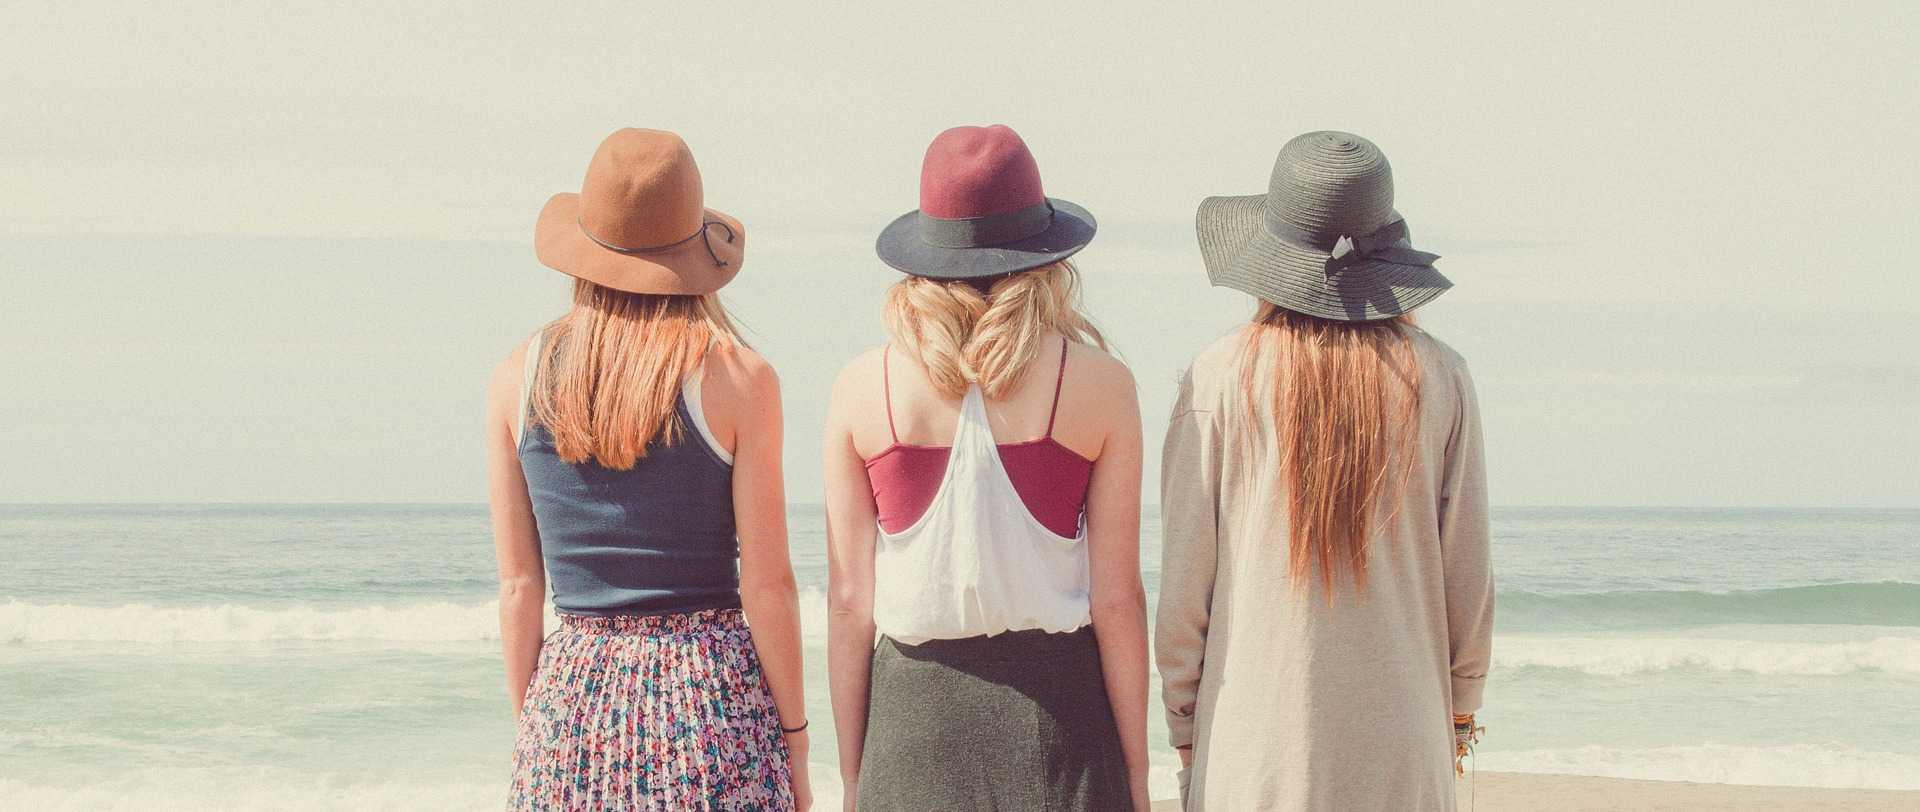 3 women on the beach facing the ocean